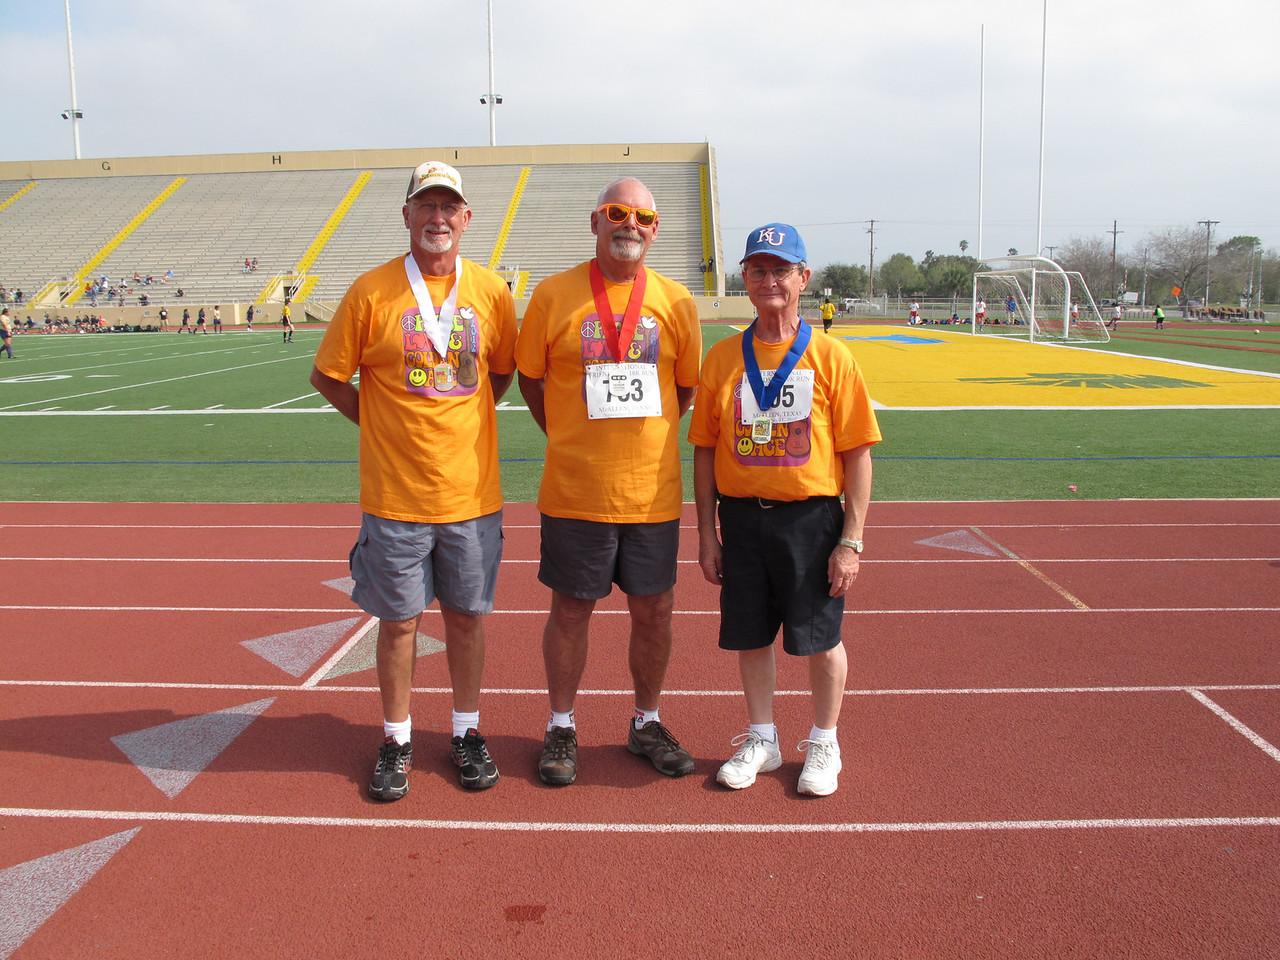 Racewalk Men 65-69 (L-R) 3rd Place - Roger Leake (Snow to Sun), 2nd Place - David Haug (Fiesta Village), 1st Place - Don Mitchell (Bit O Heaven)